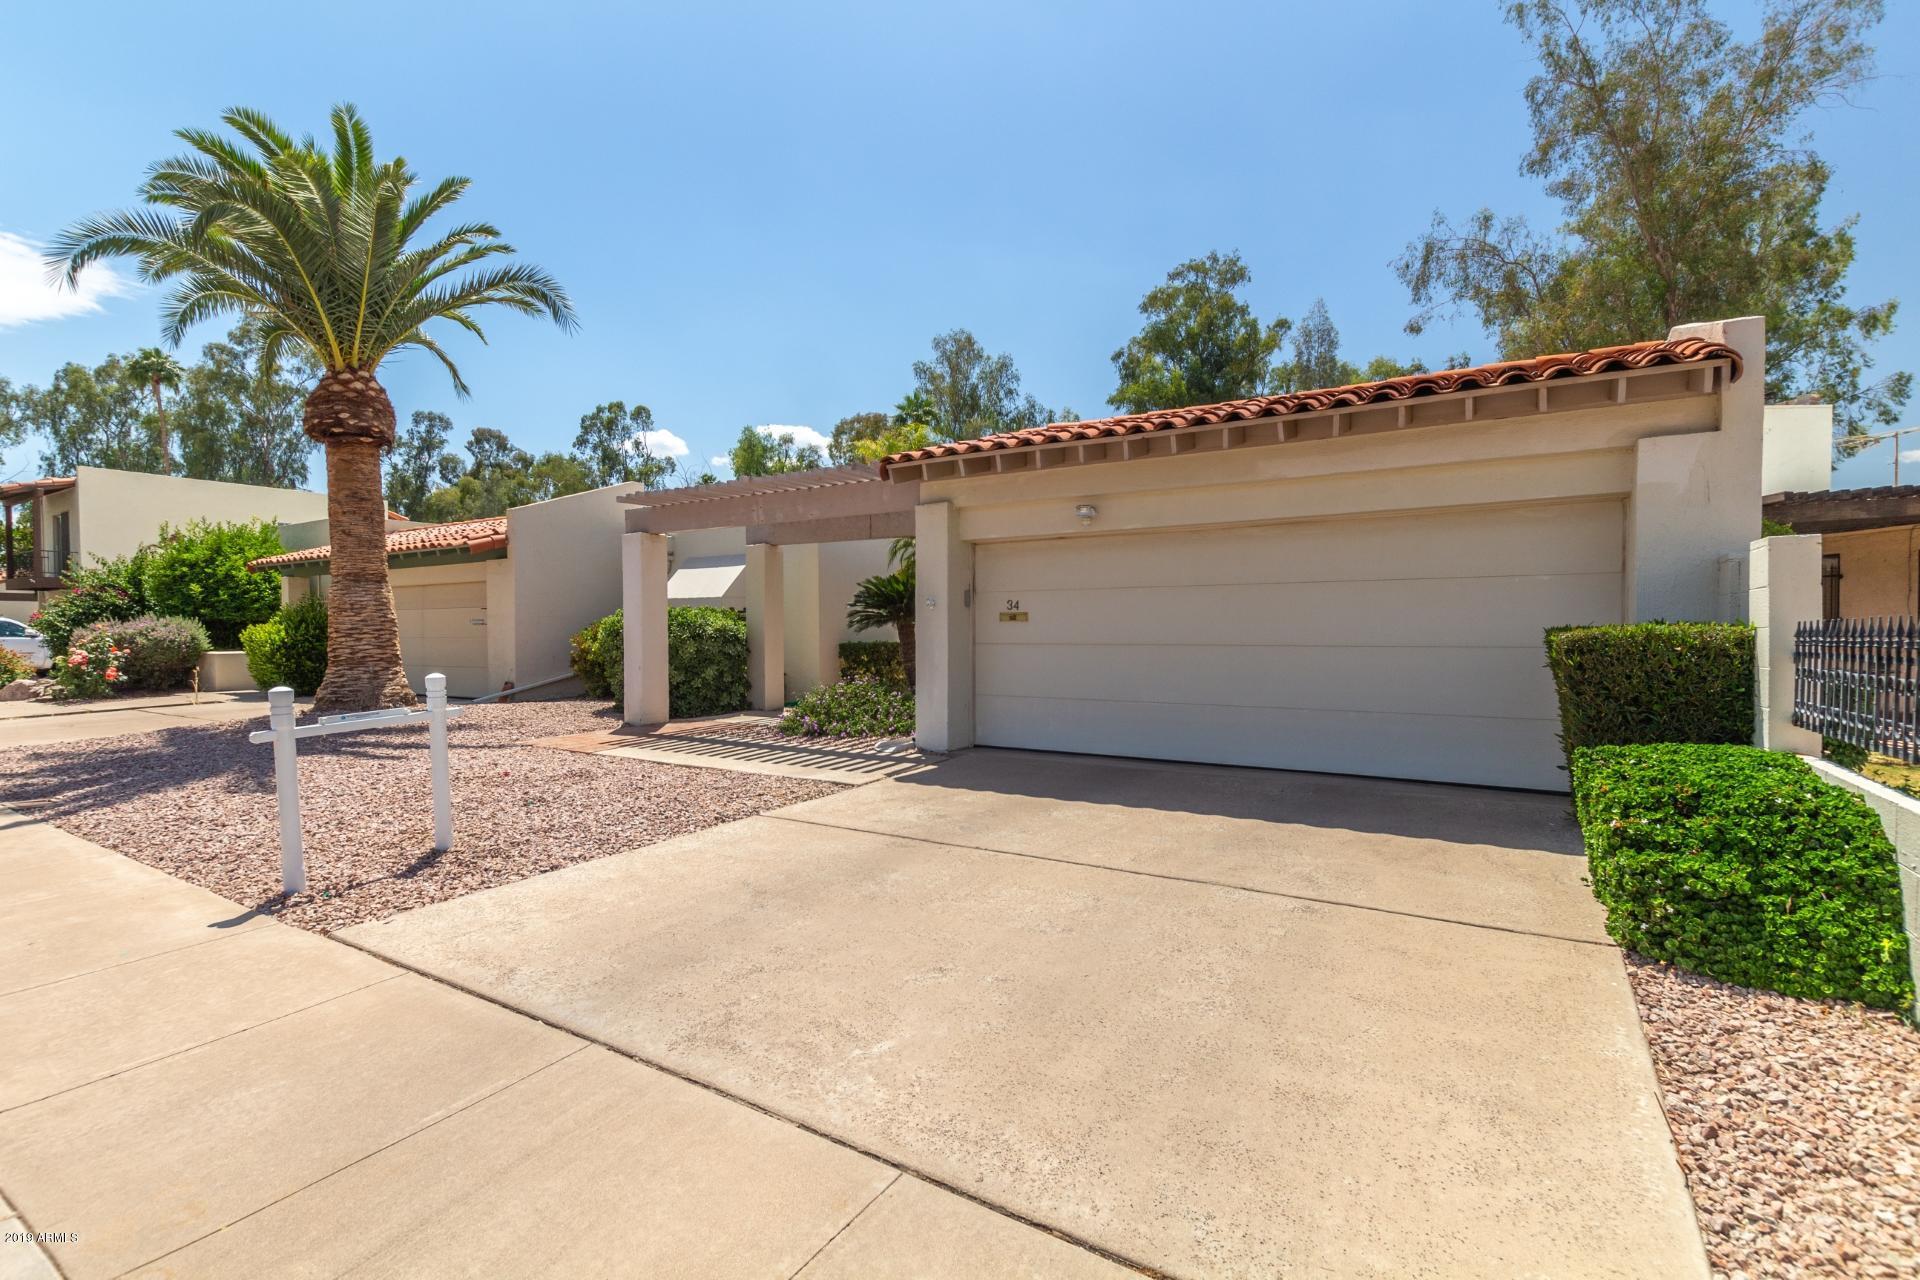 Photo of 1500 N MARKDALE -- #34, Mesa, AZ 85201